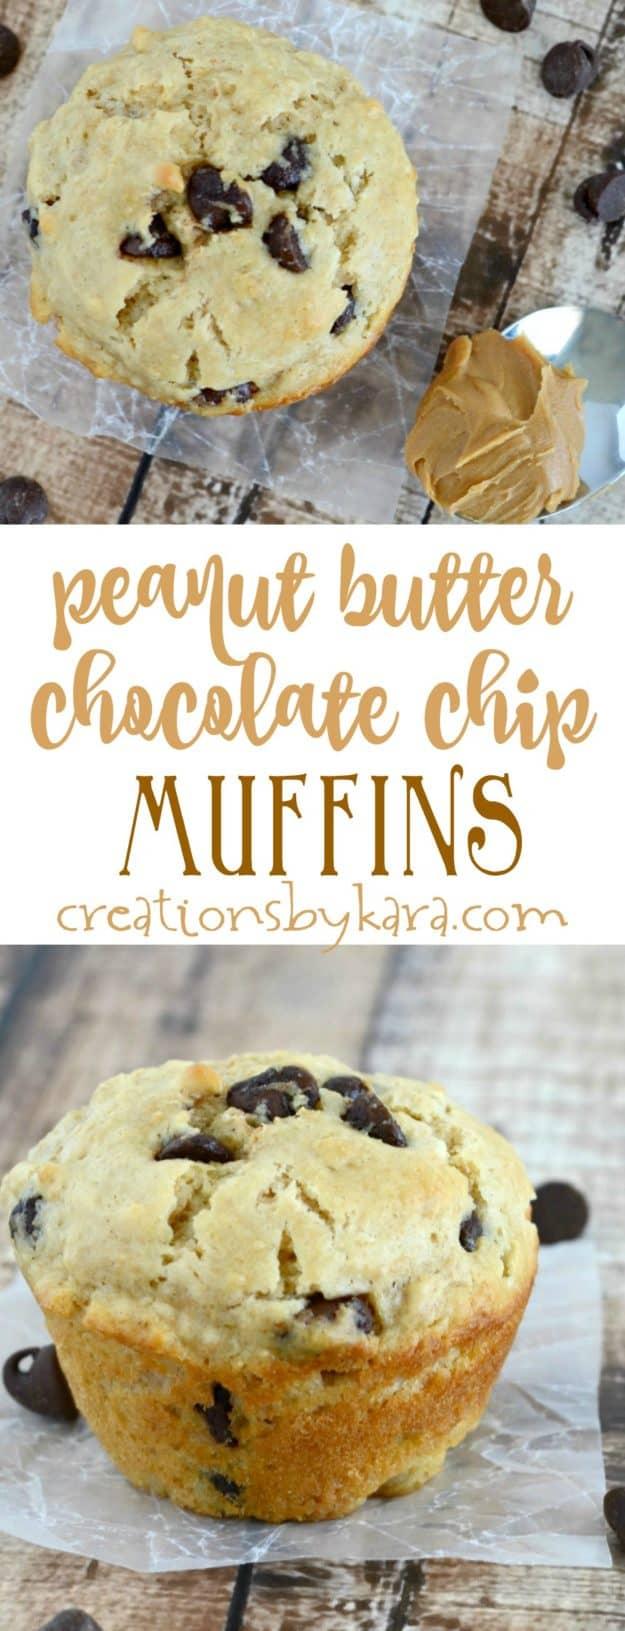 Buttermilk Peanut Butter Chocolate Chip Muffins